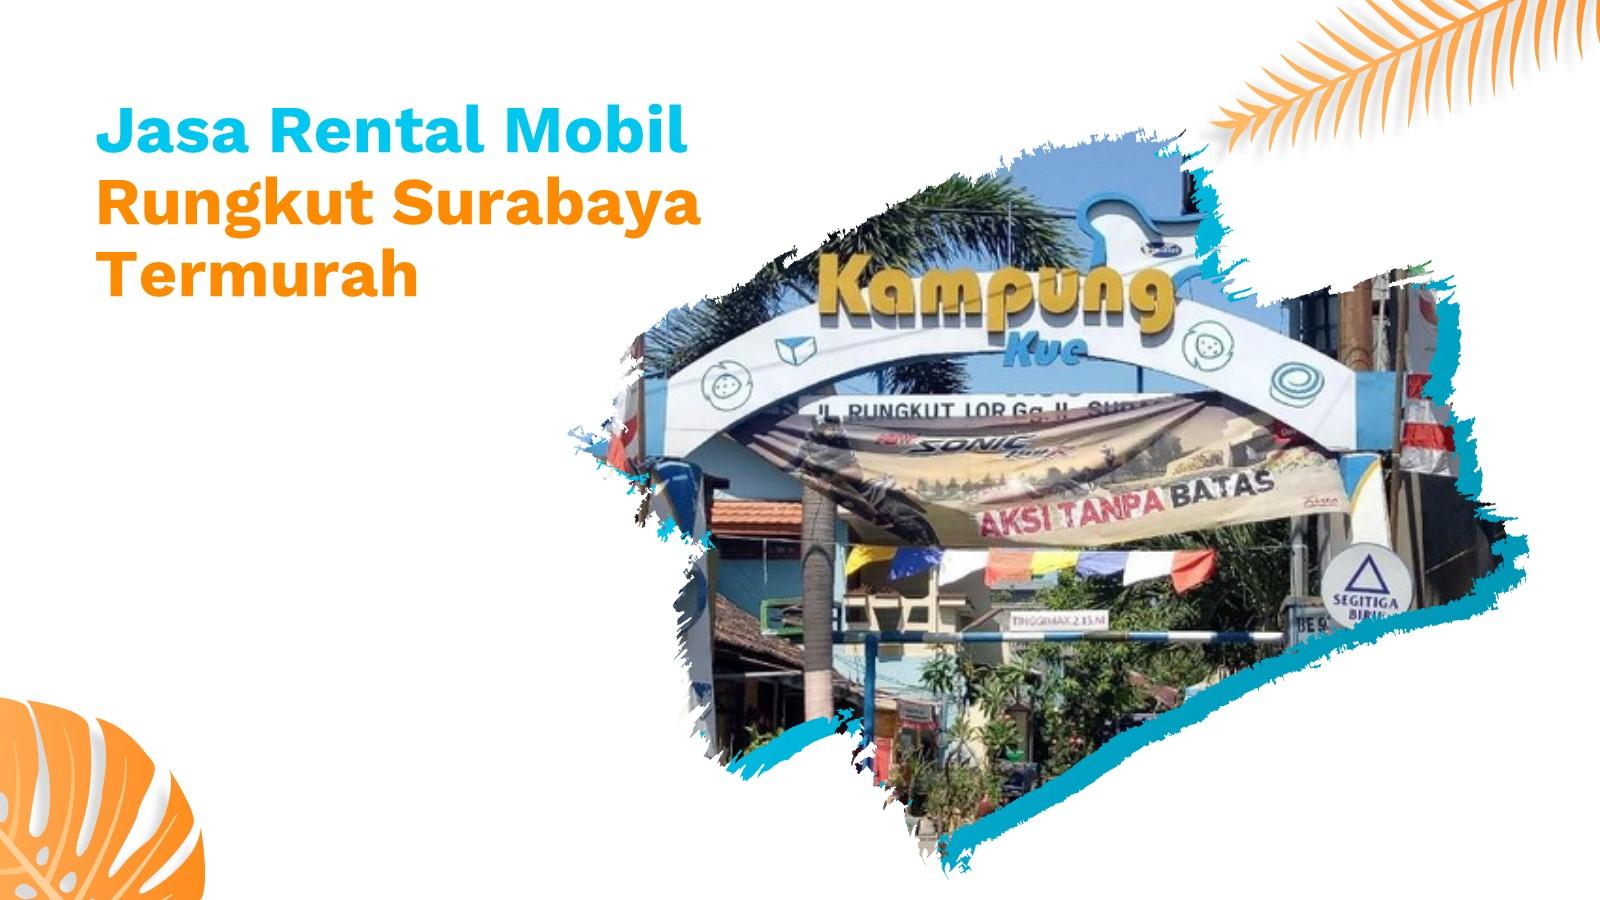 Jasa Rental Mobil Rungkut Surabaya Termurah